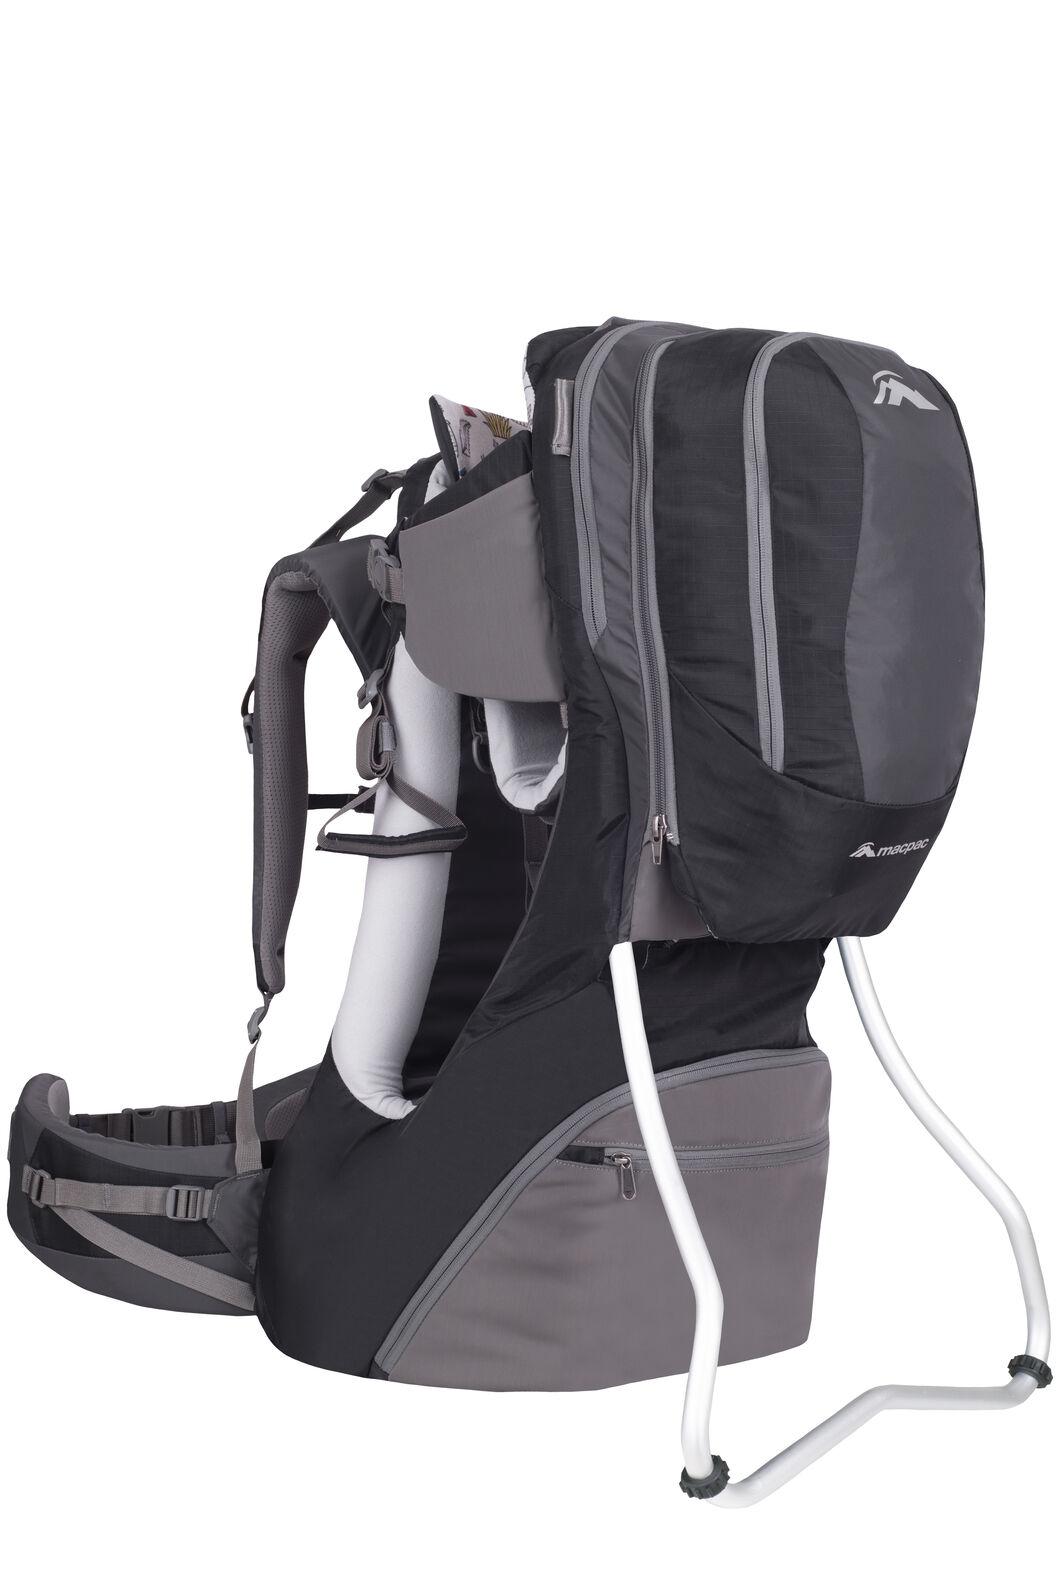 Macpac Vamoose Child Carrier V2, Black/Forged Iron, hi-res